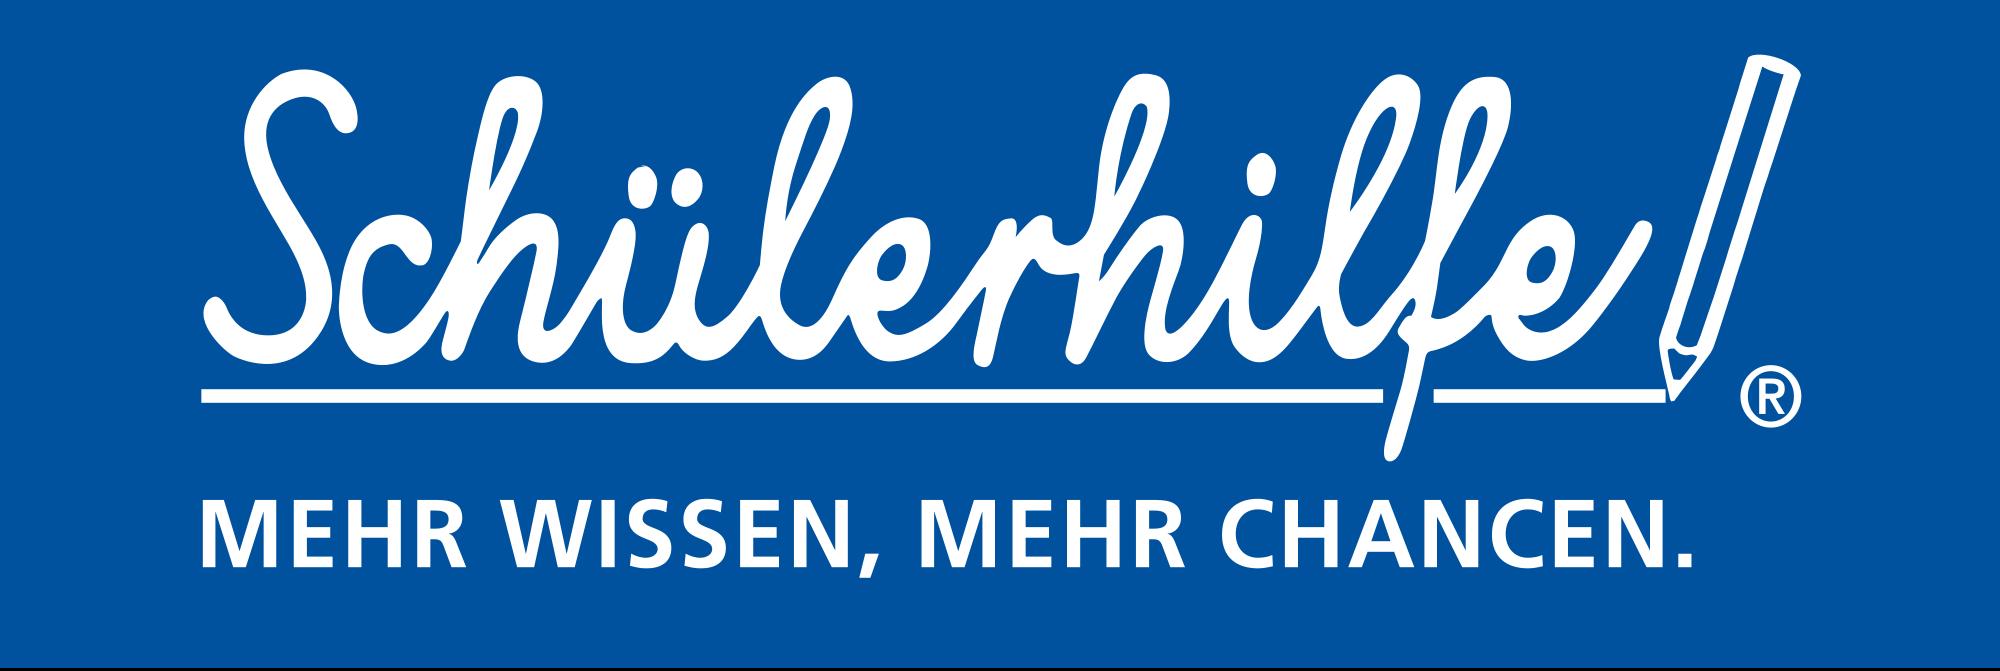 Schuelerhilfe - ZGS Bildungs-Gmbh